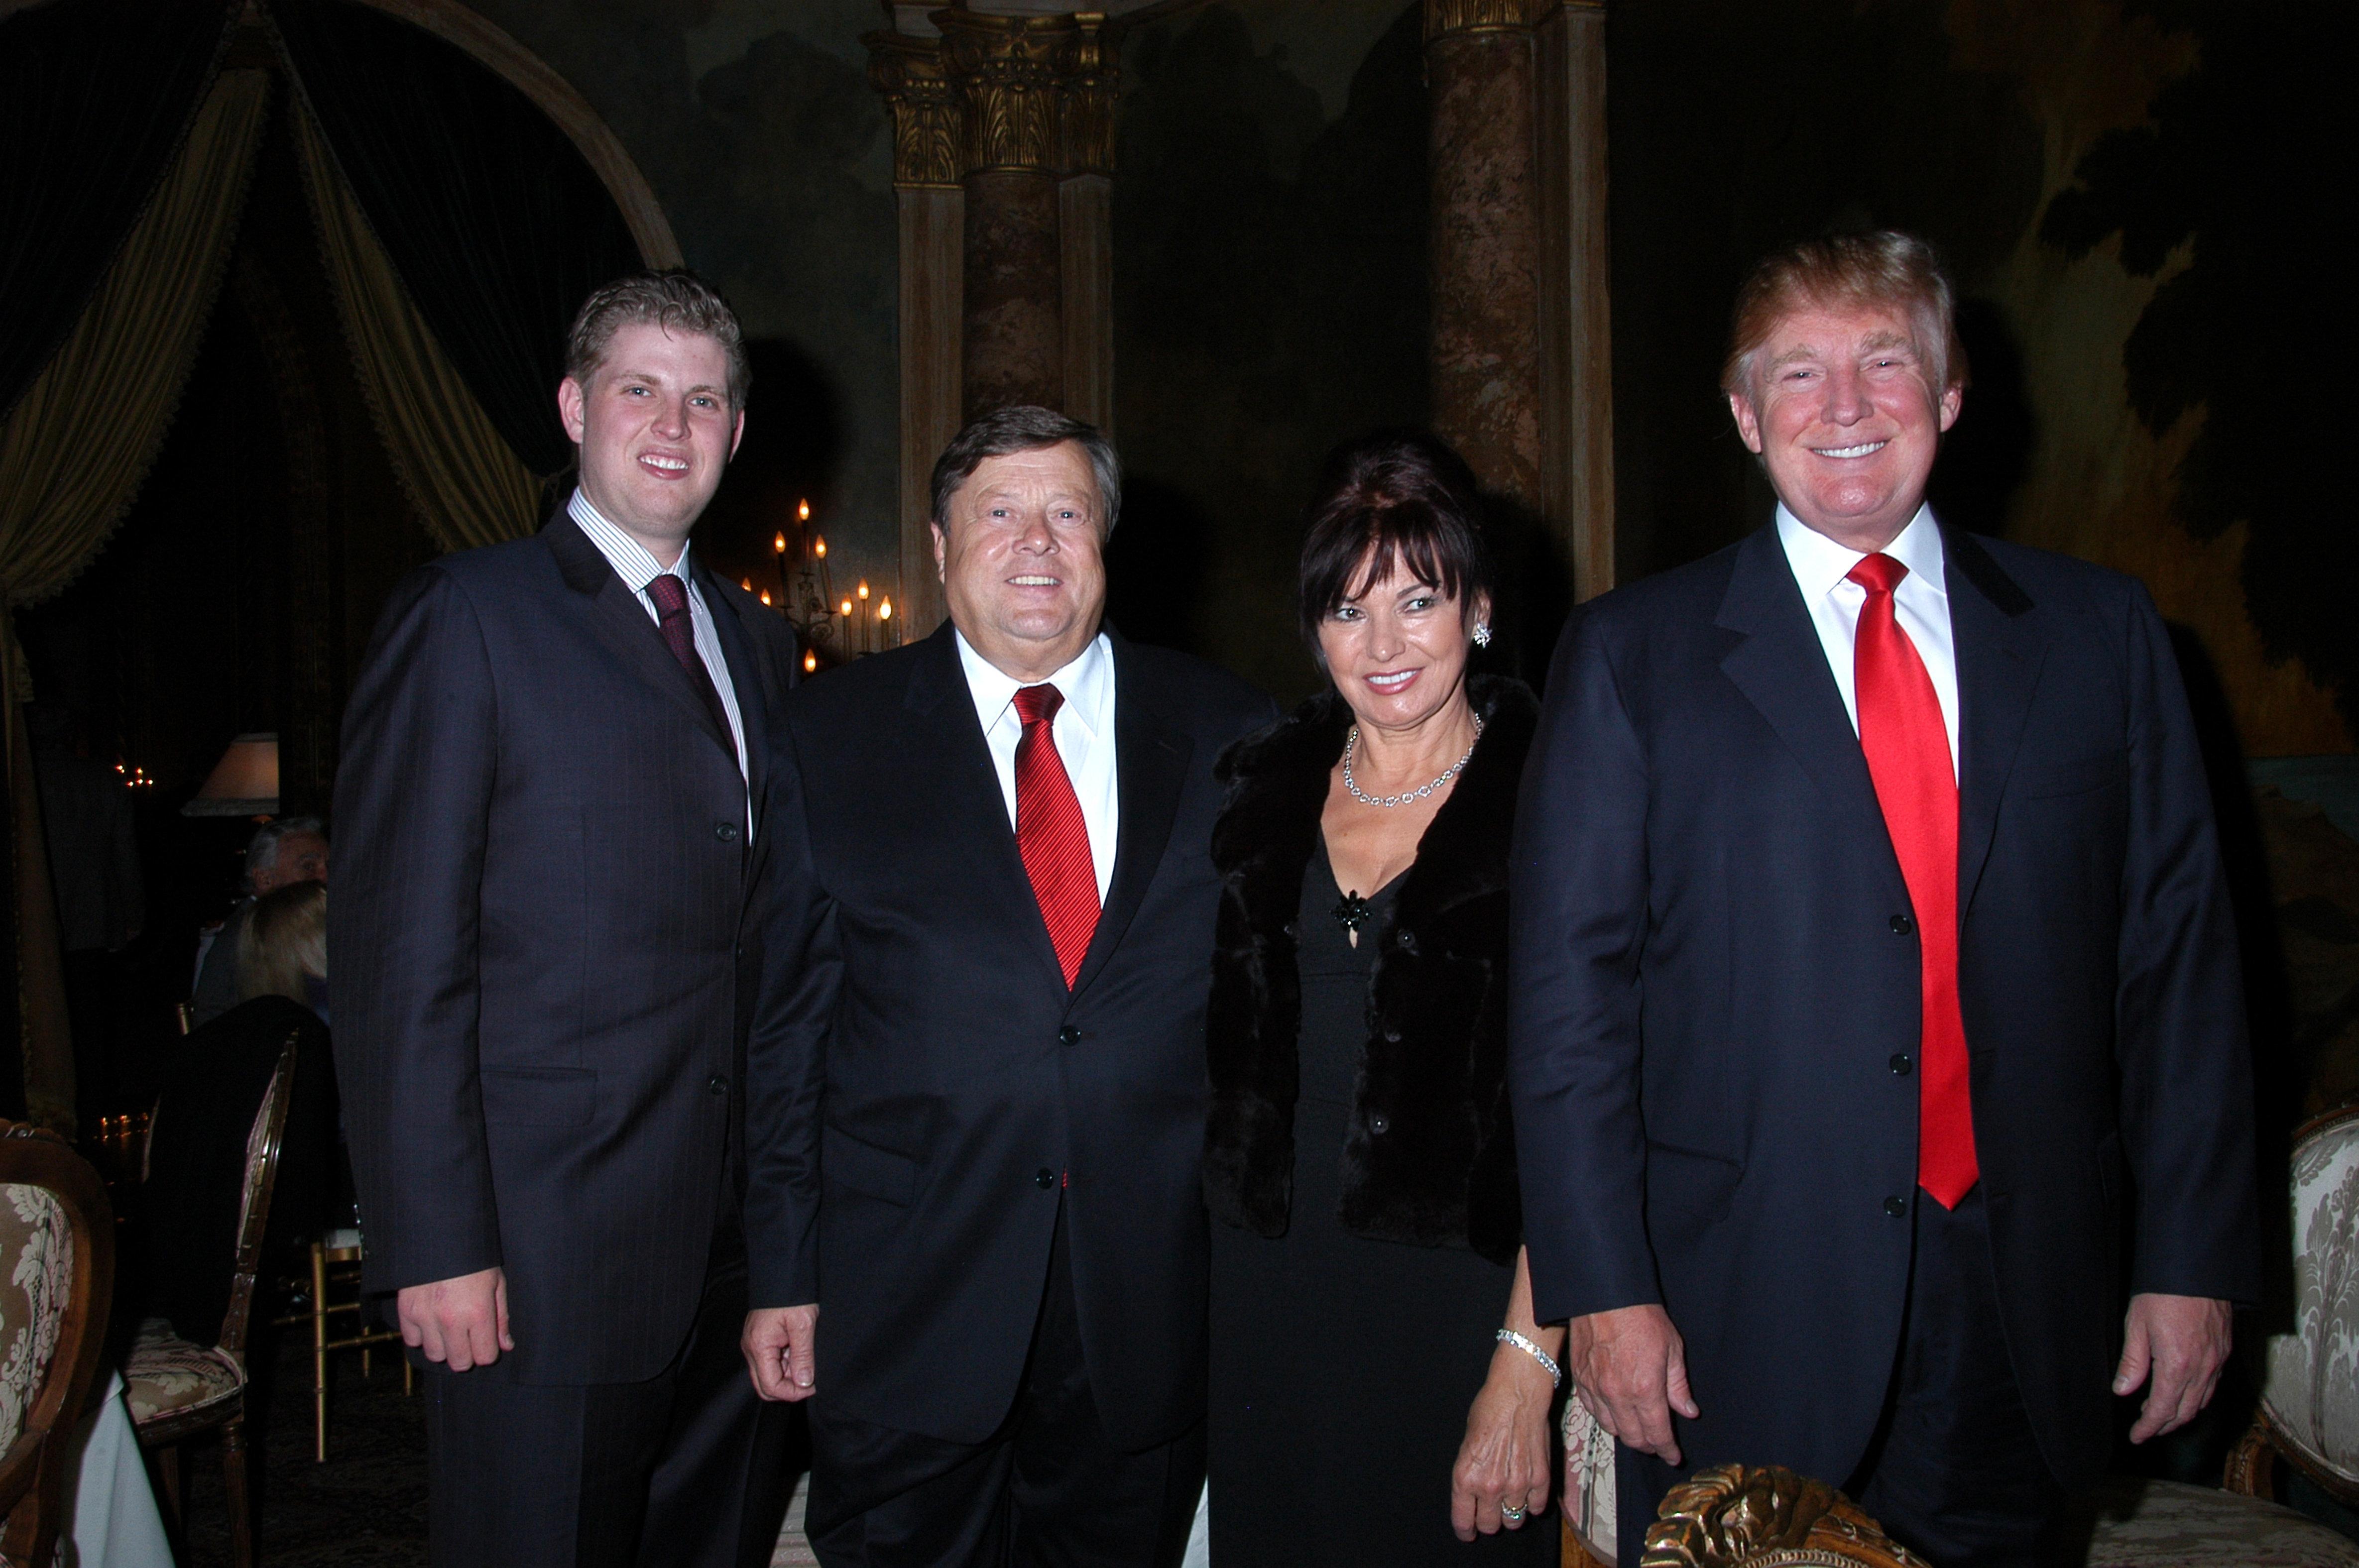 Eric Trump, Viktor Knavs, Amalija Knavs, and Donald Trump pictured in 2006.